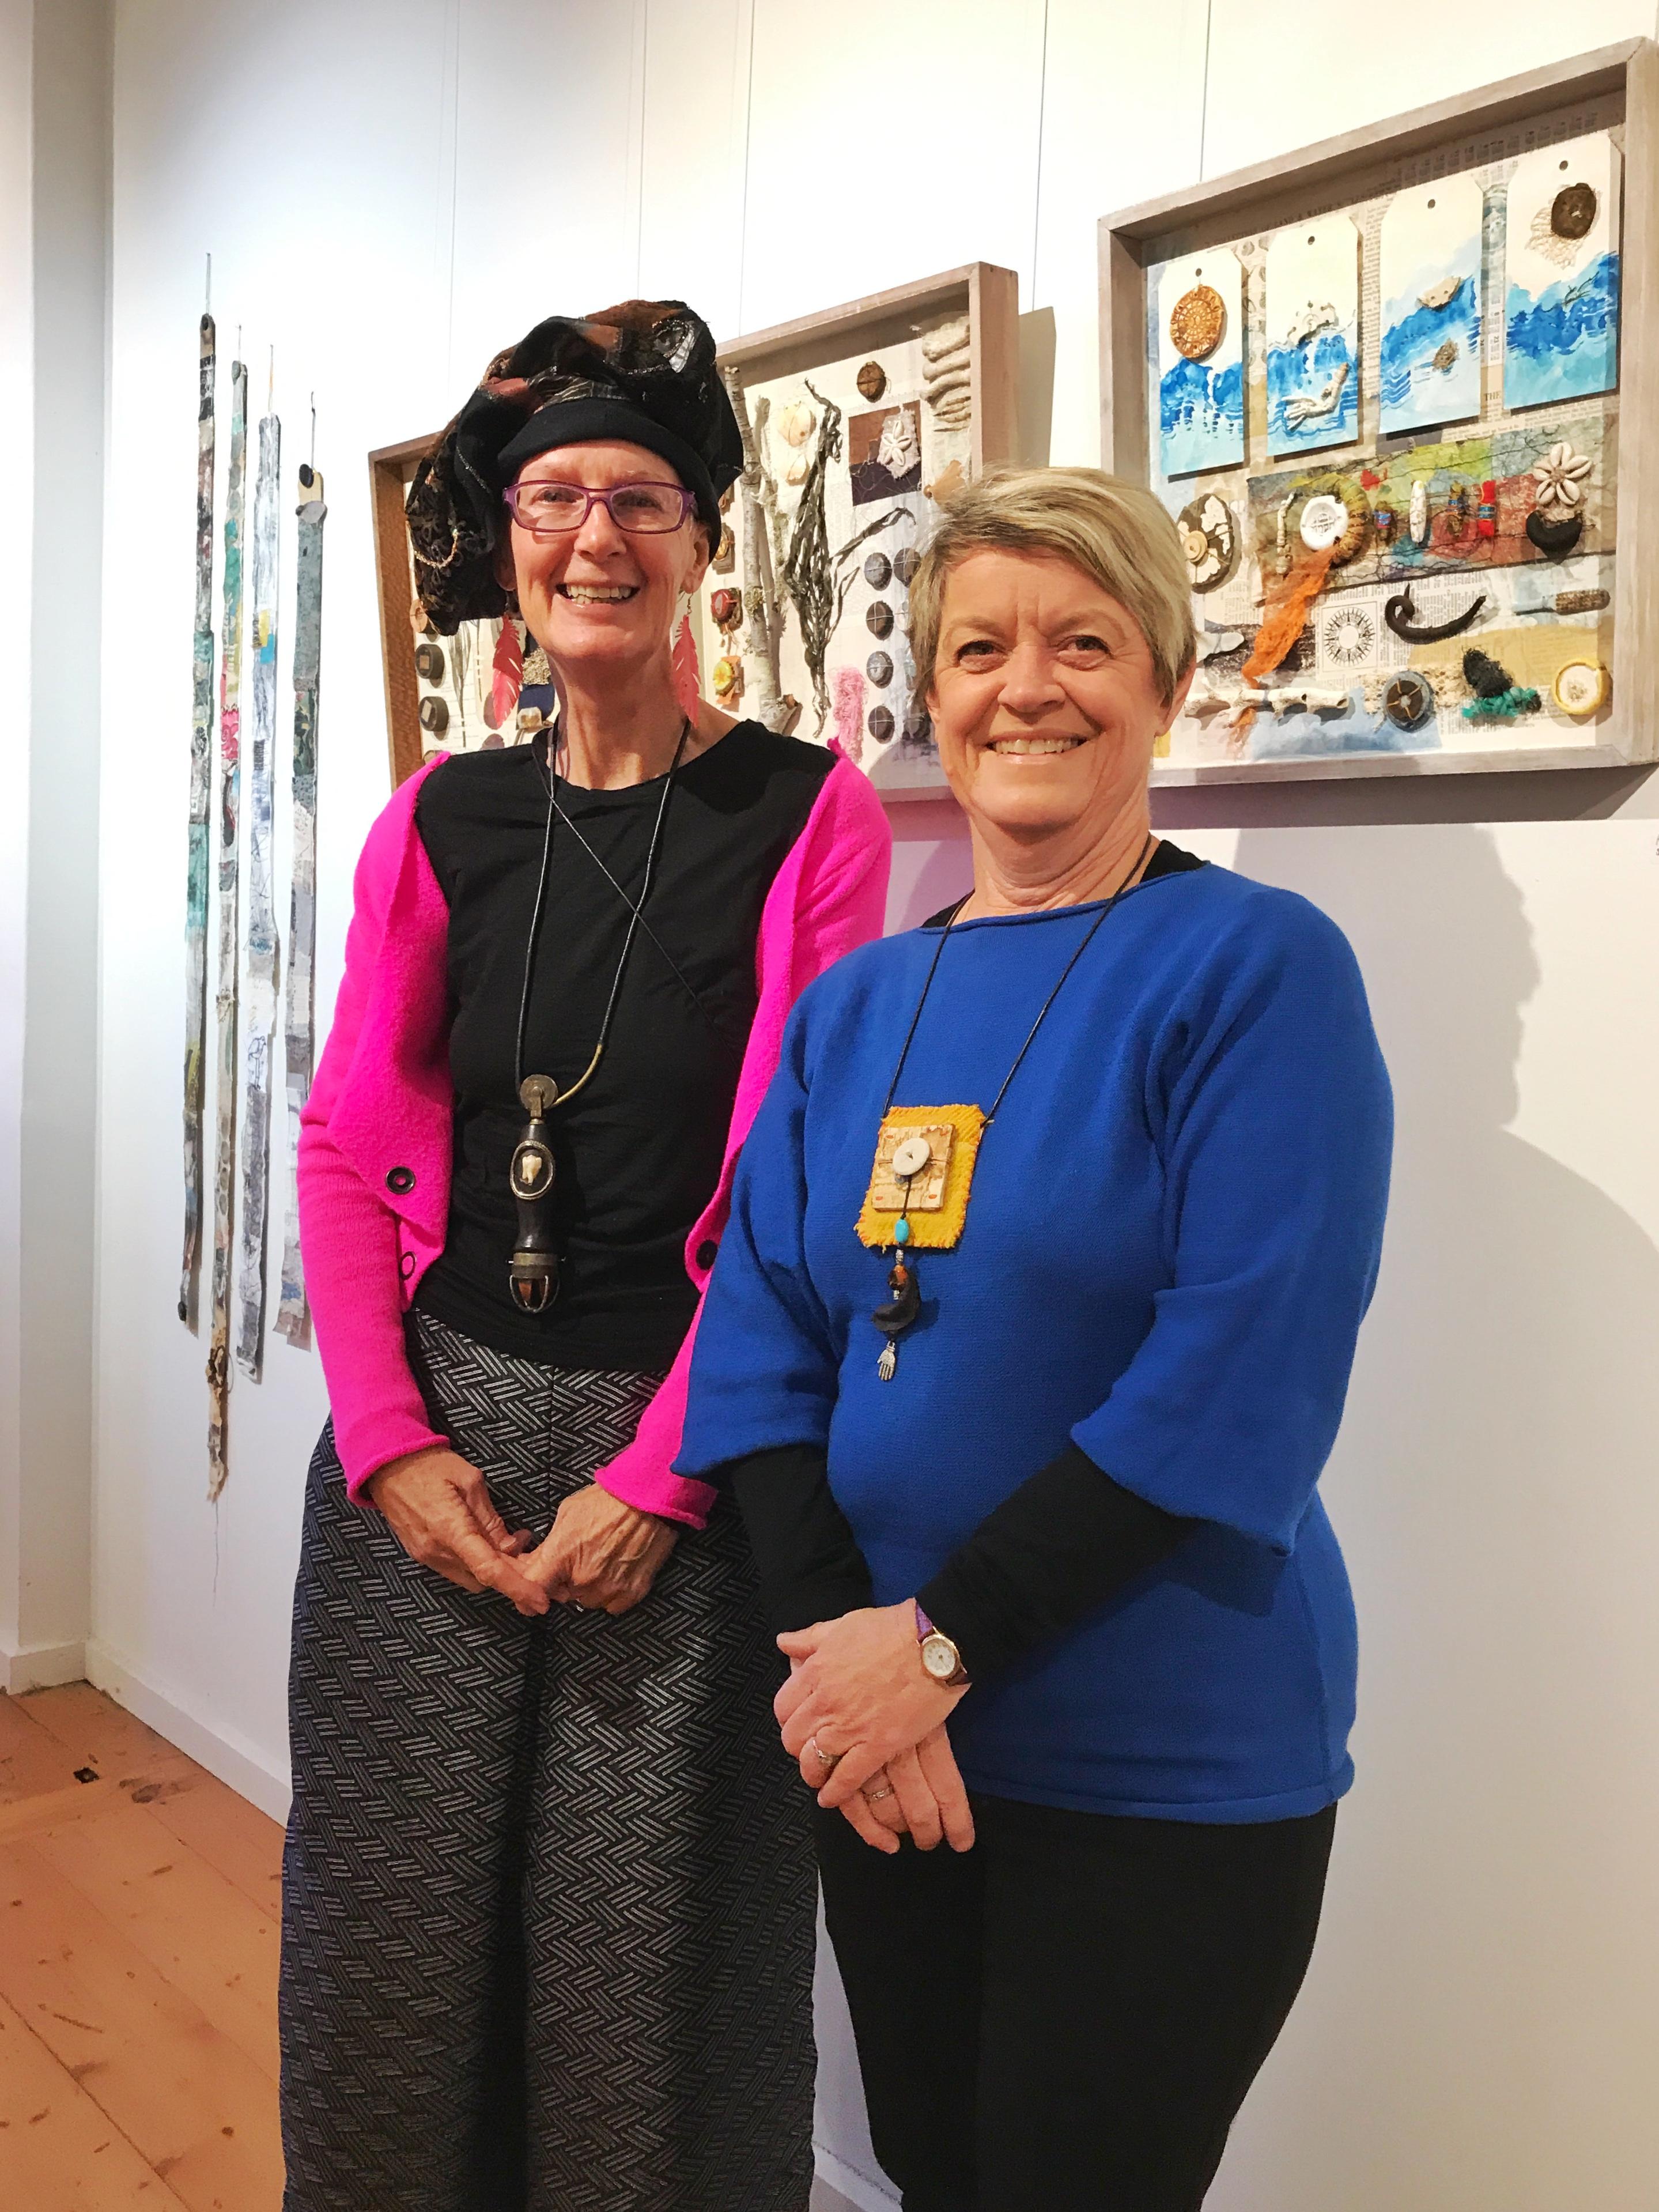 Peta Lloyd (left) & Nanette Balchin